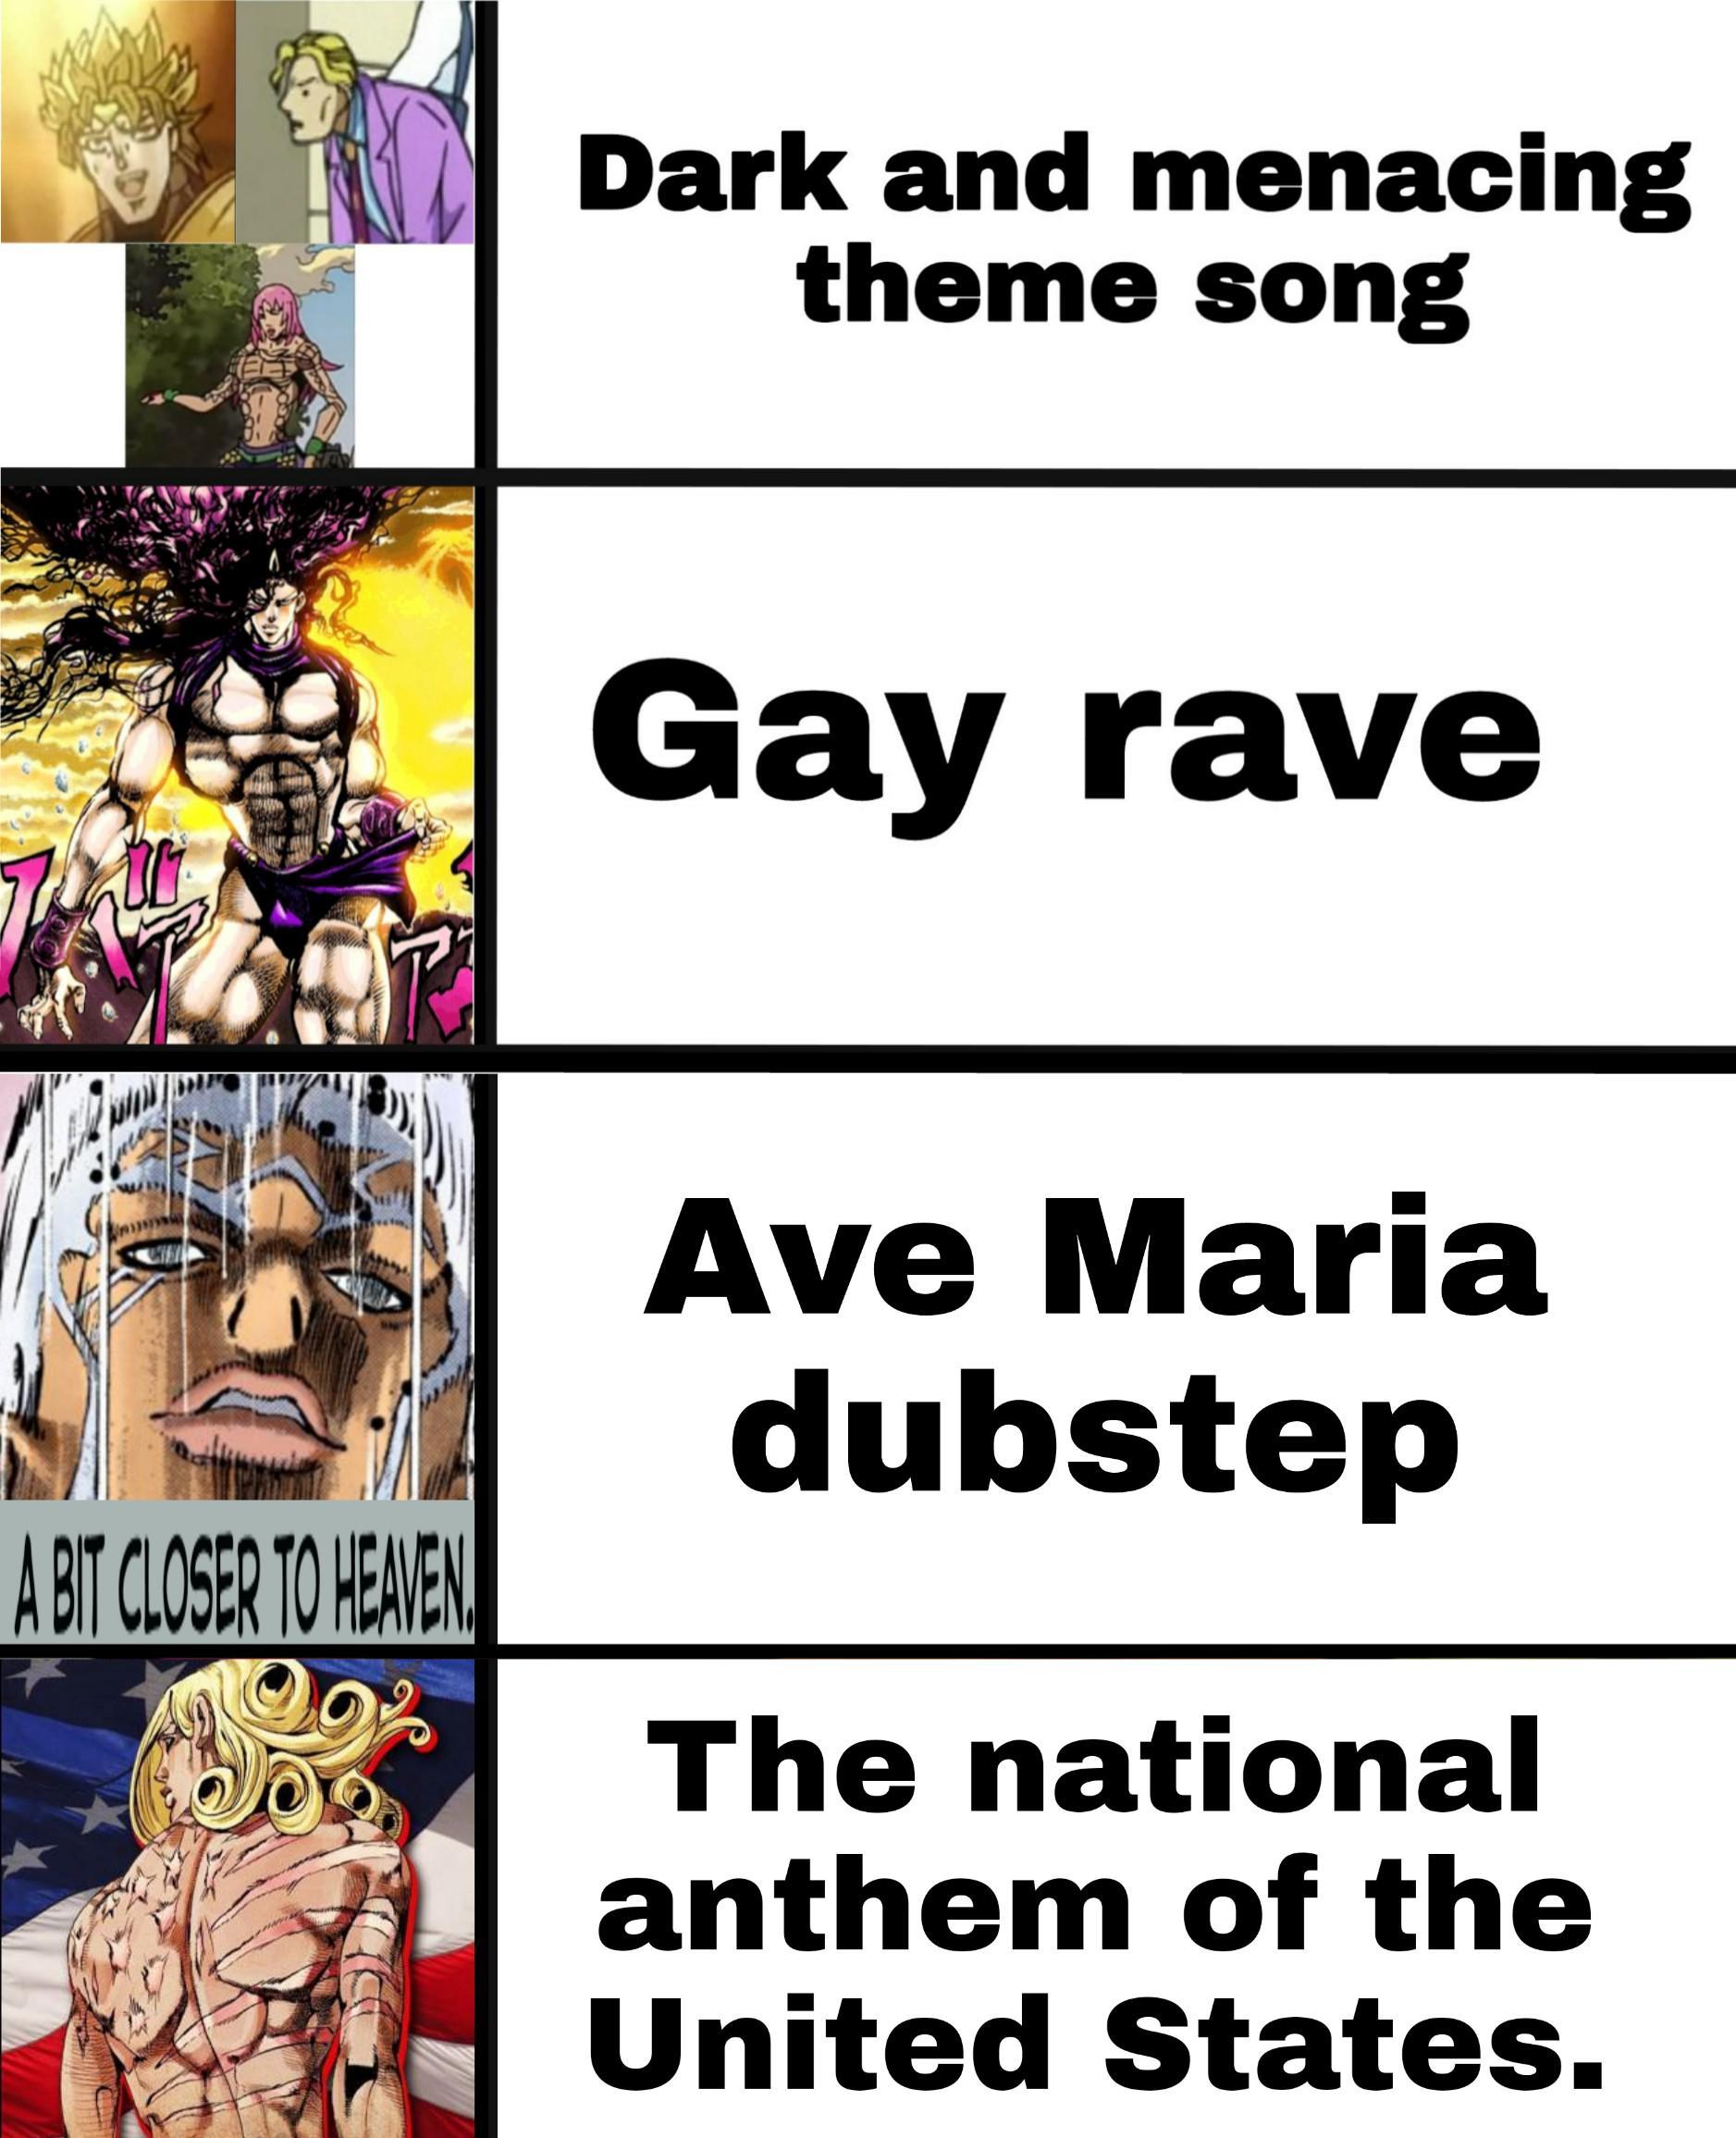 Jojo Song Meme : Theme, Songs, Villains, /r/ShitPostCrusaders/, JoJo's, Bizarre, Adventure